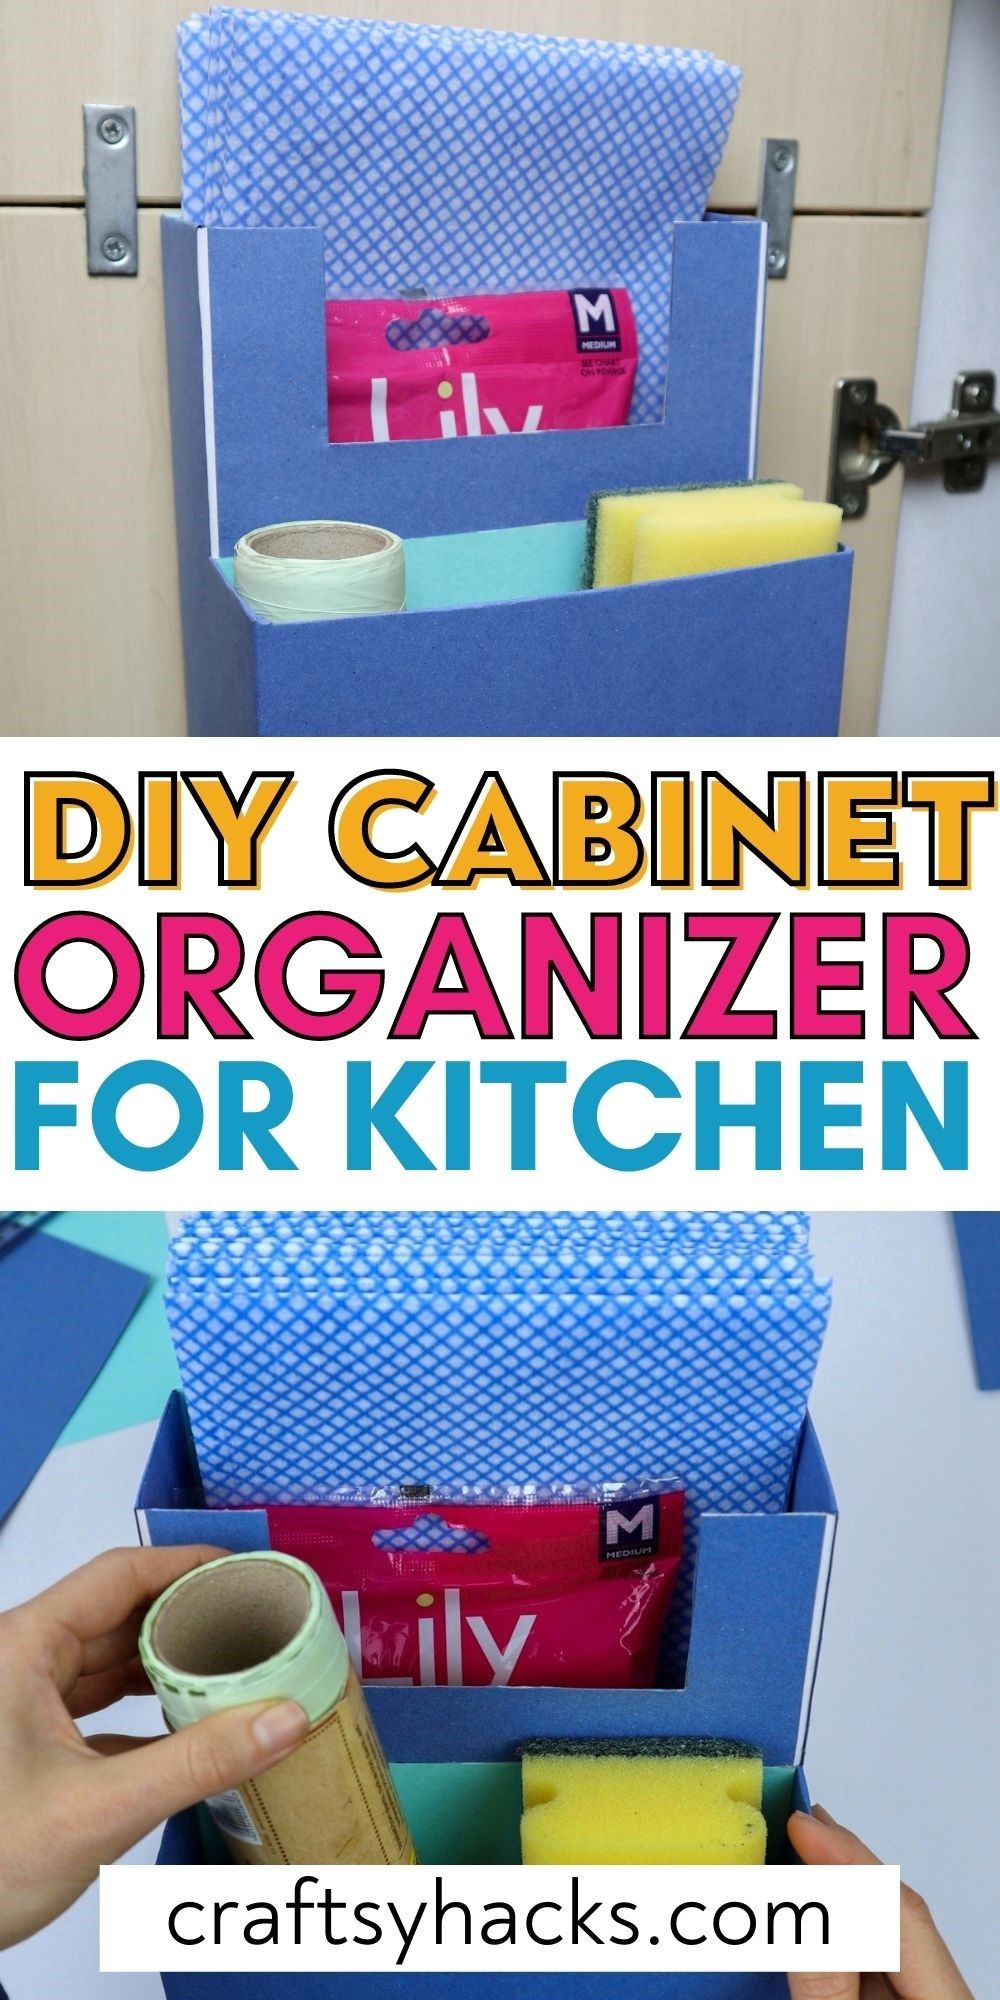 diy cabinet organizer for kitchen pinterest pin